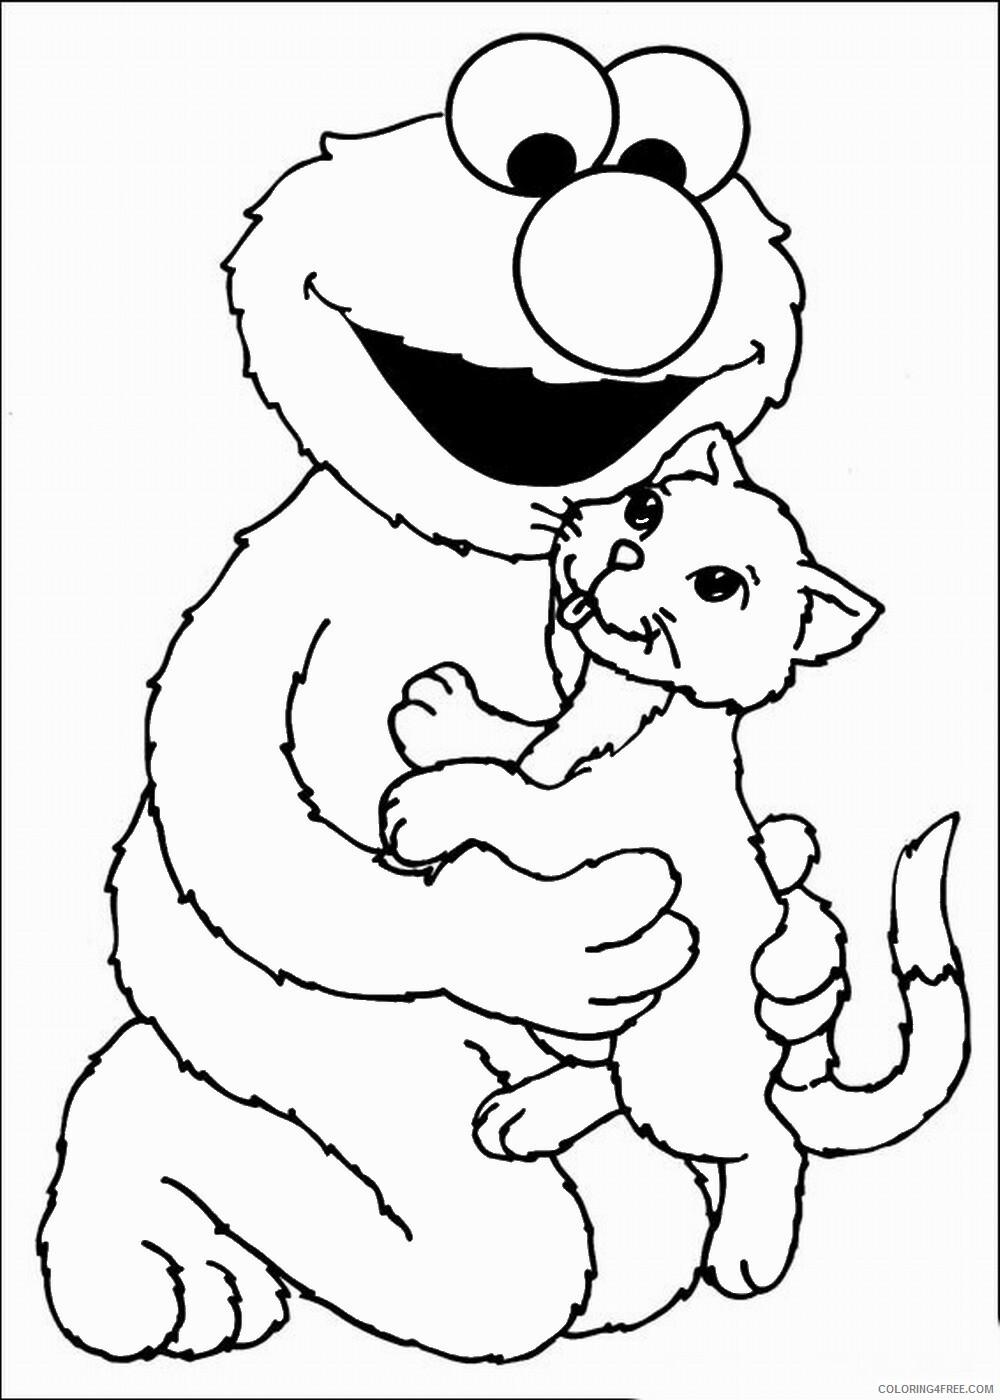 Sesame Street Coloring Pages TV Film sesame_18 Printable 2020 07373 Coloring4free